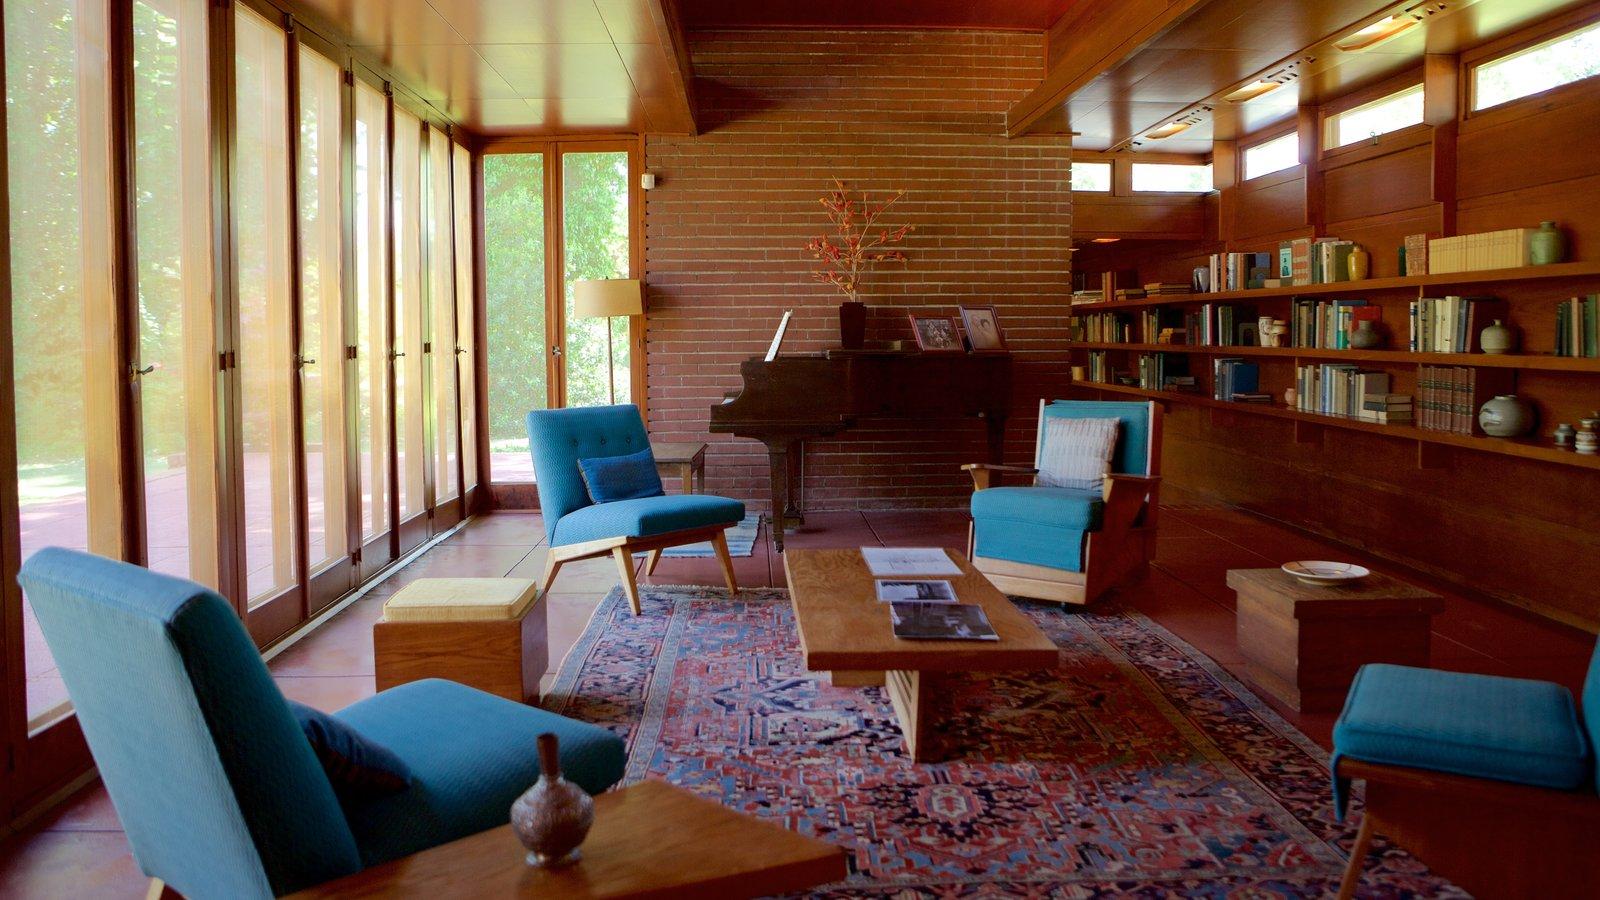 Frank Lloyd Wright Rosenbaum House Pictures View Photos